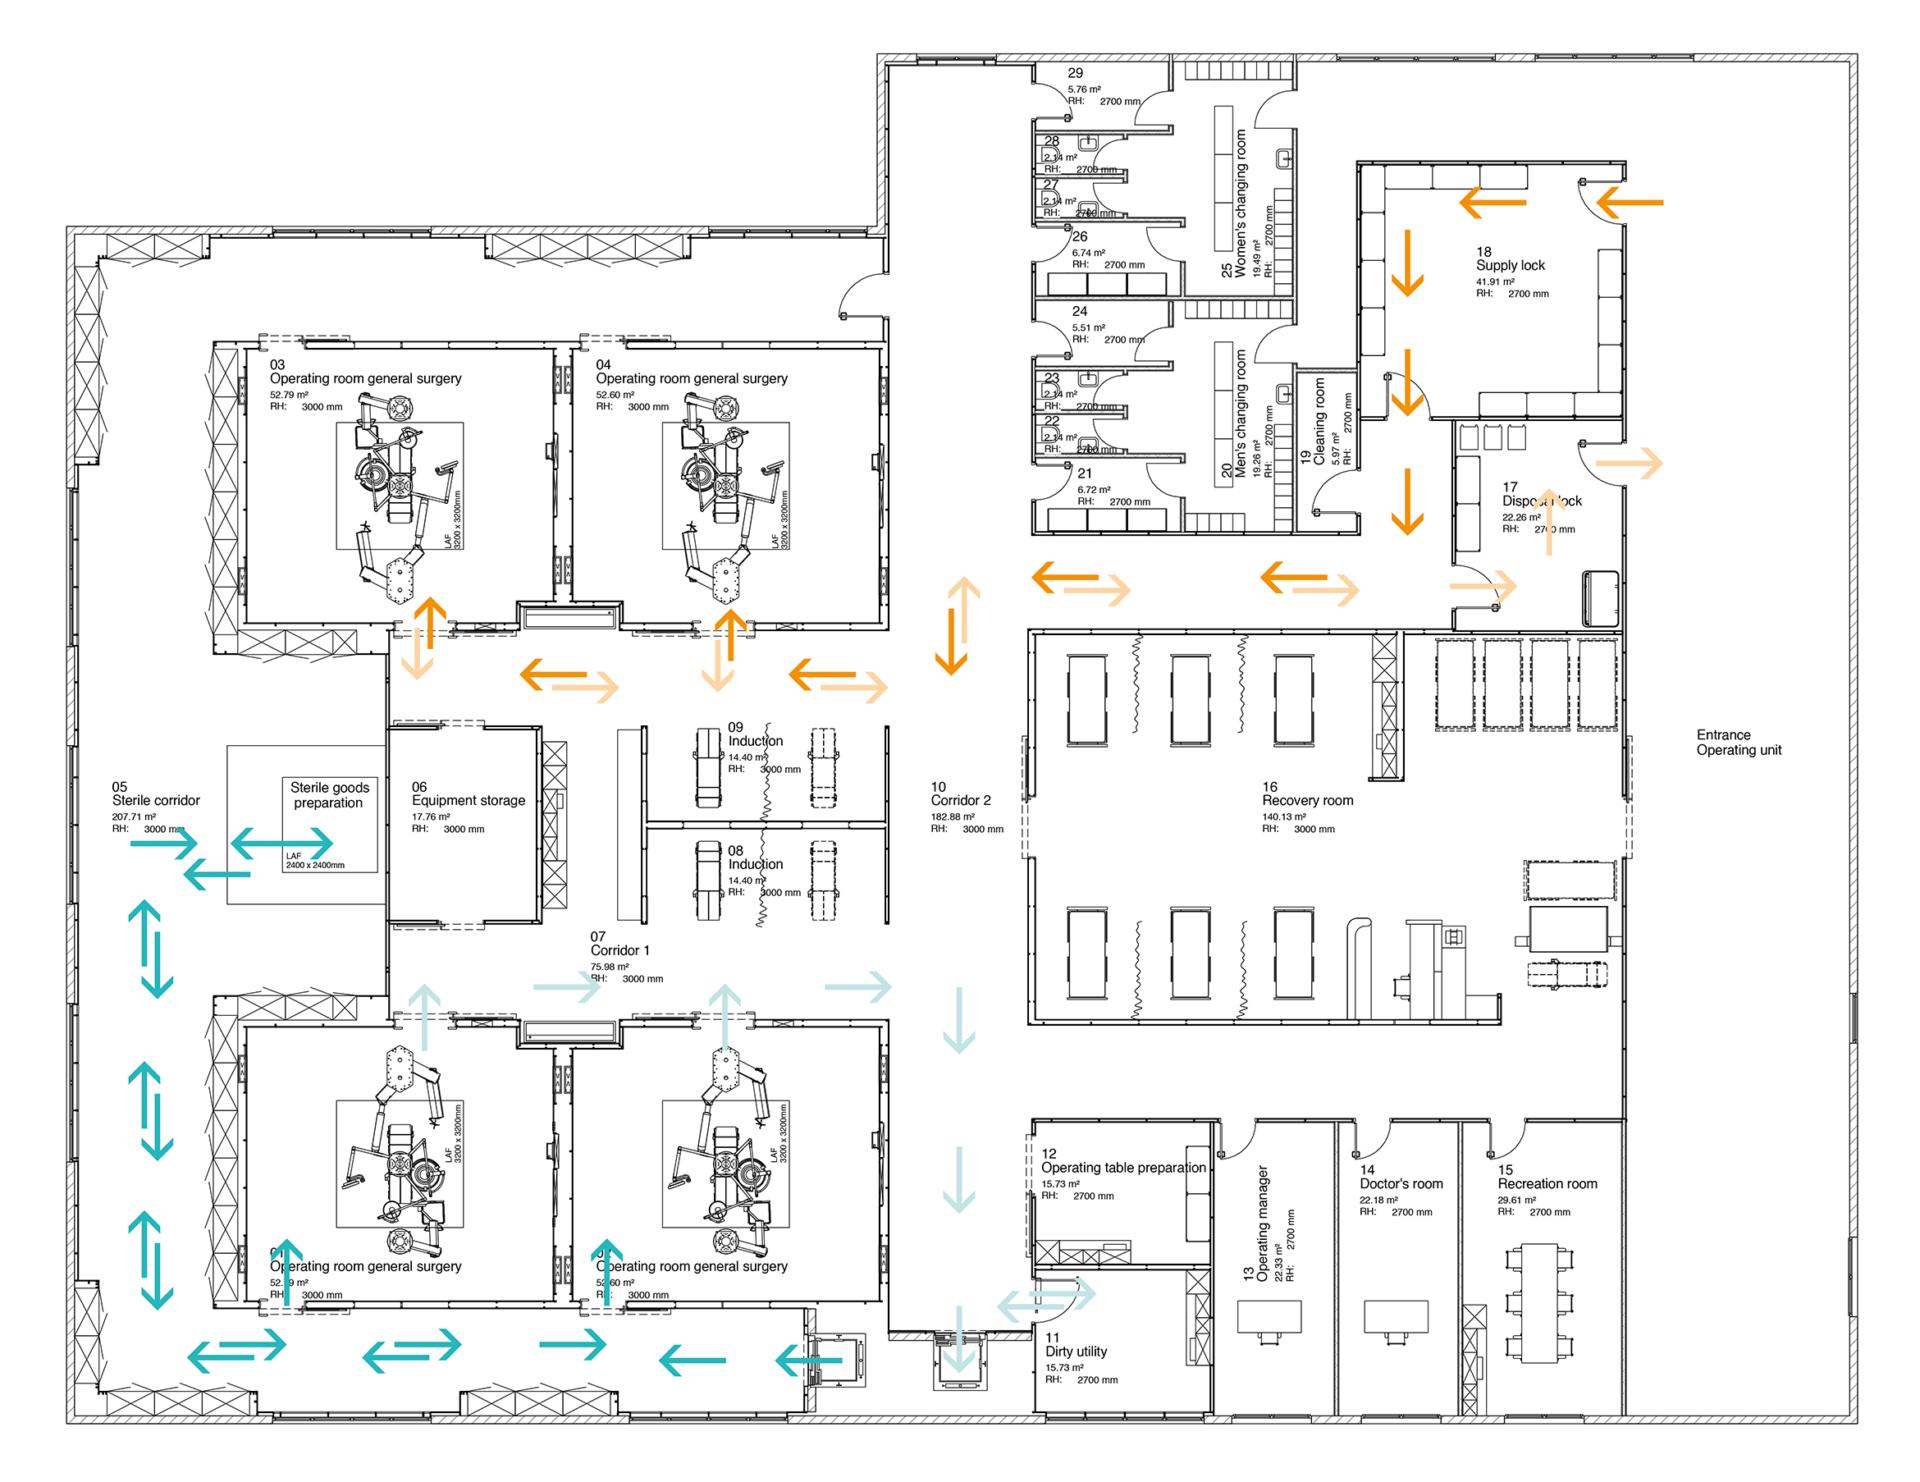 4 Operating Rooms Operating Room Hospital Plans Hospital Design